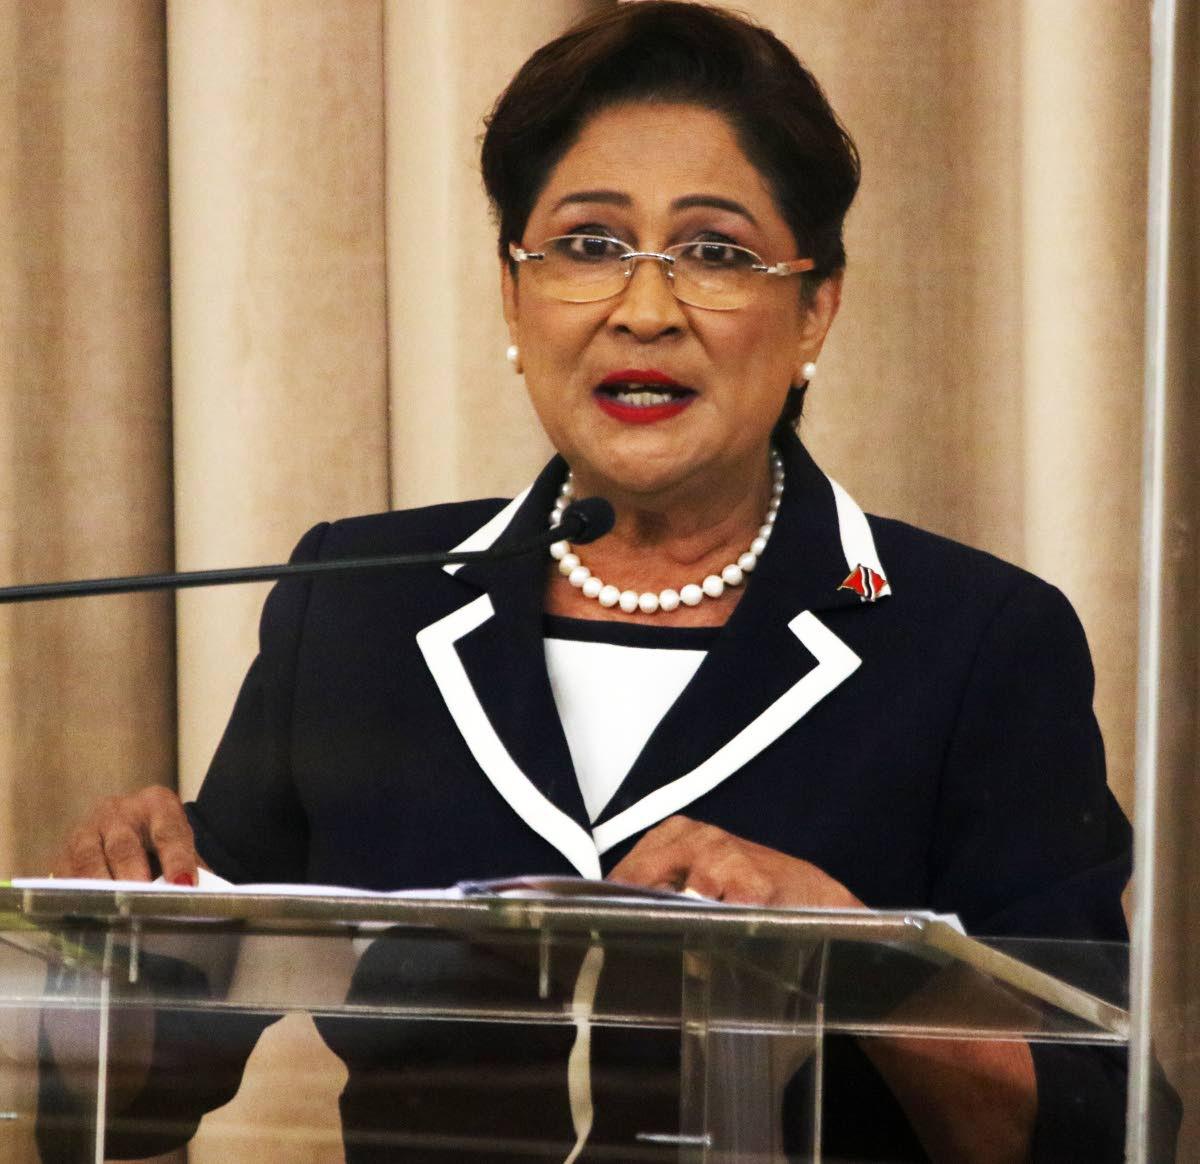 '2020 budget deficit $23b, not $16.8b': Kamla wants answers - Trinidad and Tobago Newsday